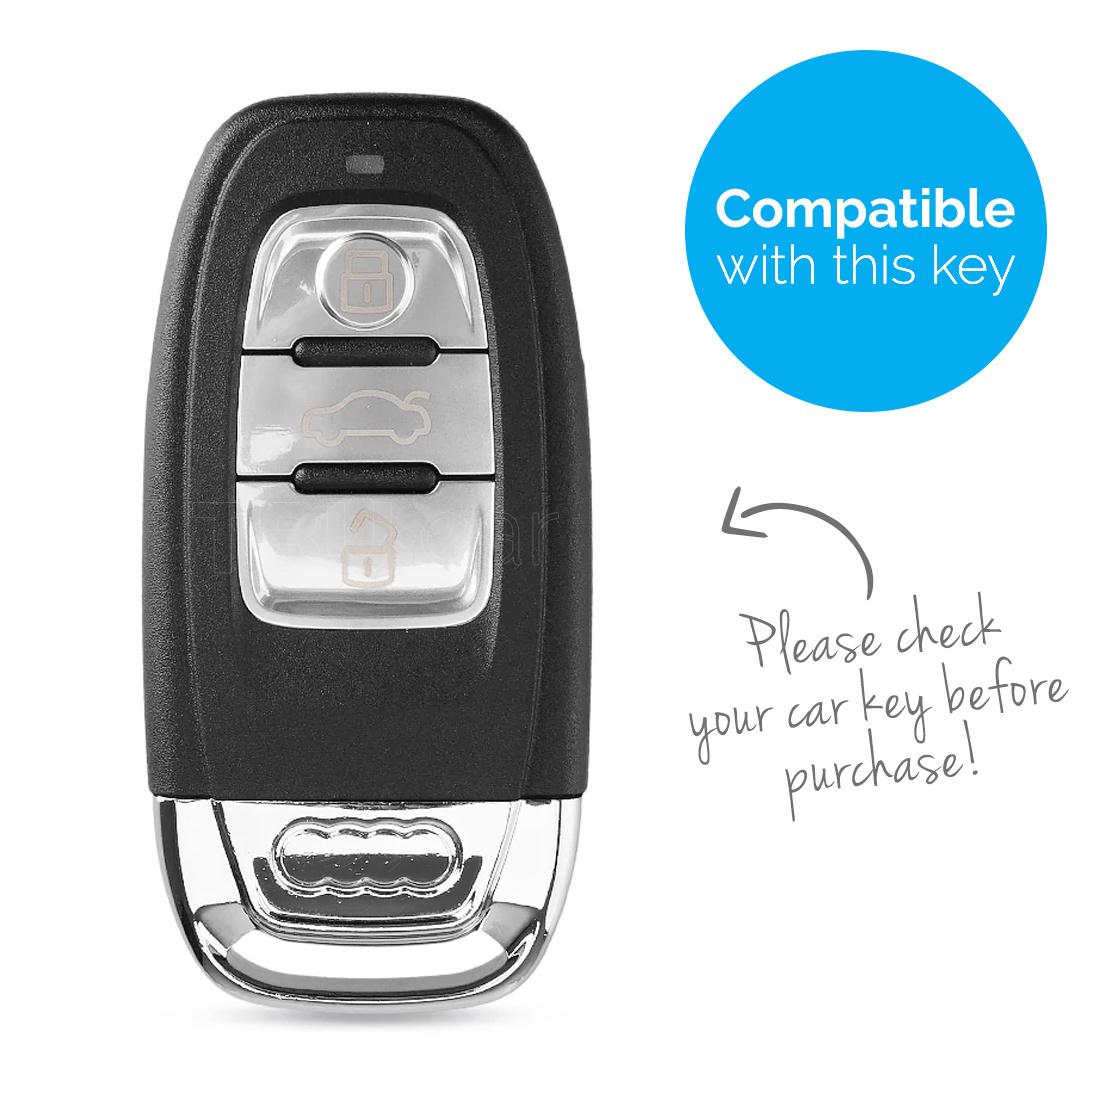 TBU car TBUCAR Sleutel cover compatibel met Audi - Silicone sleutelhoesje - beschermhoesje autosleutel - Roze